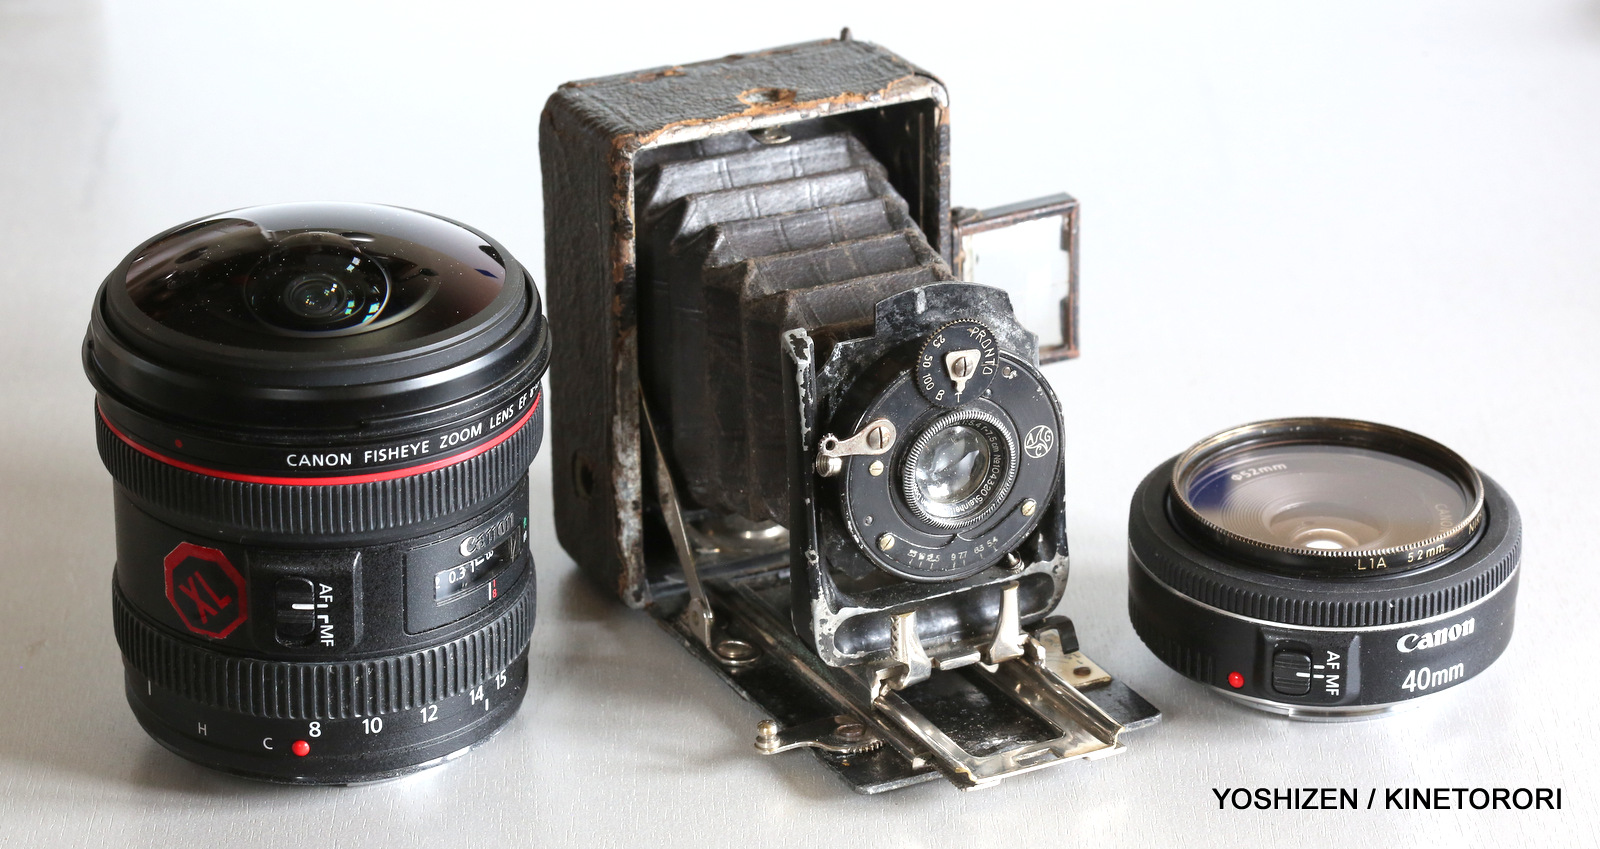 Design Len München anastigmat lens design yoshizen s